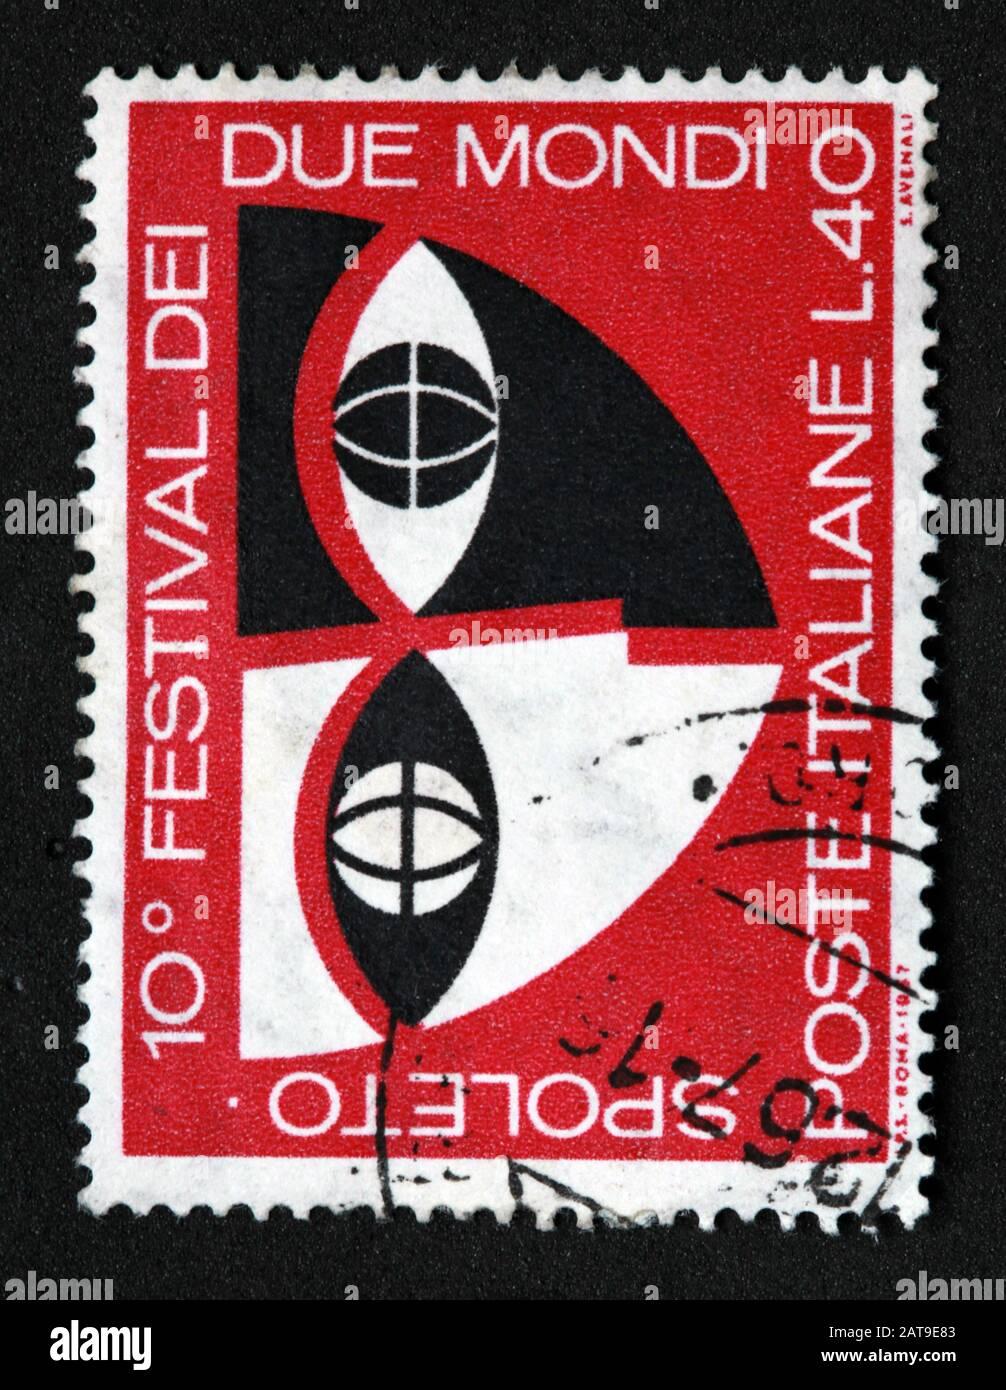 Dieses Stockfoto: Italienische Briefmarke, poste Italia verwendete und frankierte Stempel, Poste Italiane 10th Festival Dei Spoleto Due Mondi 0,40Lire L.40 - 2AT9E8